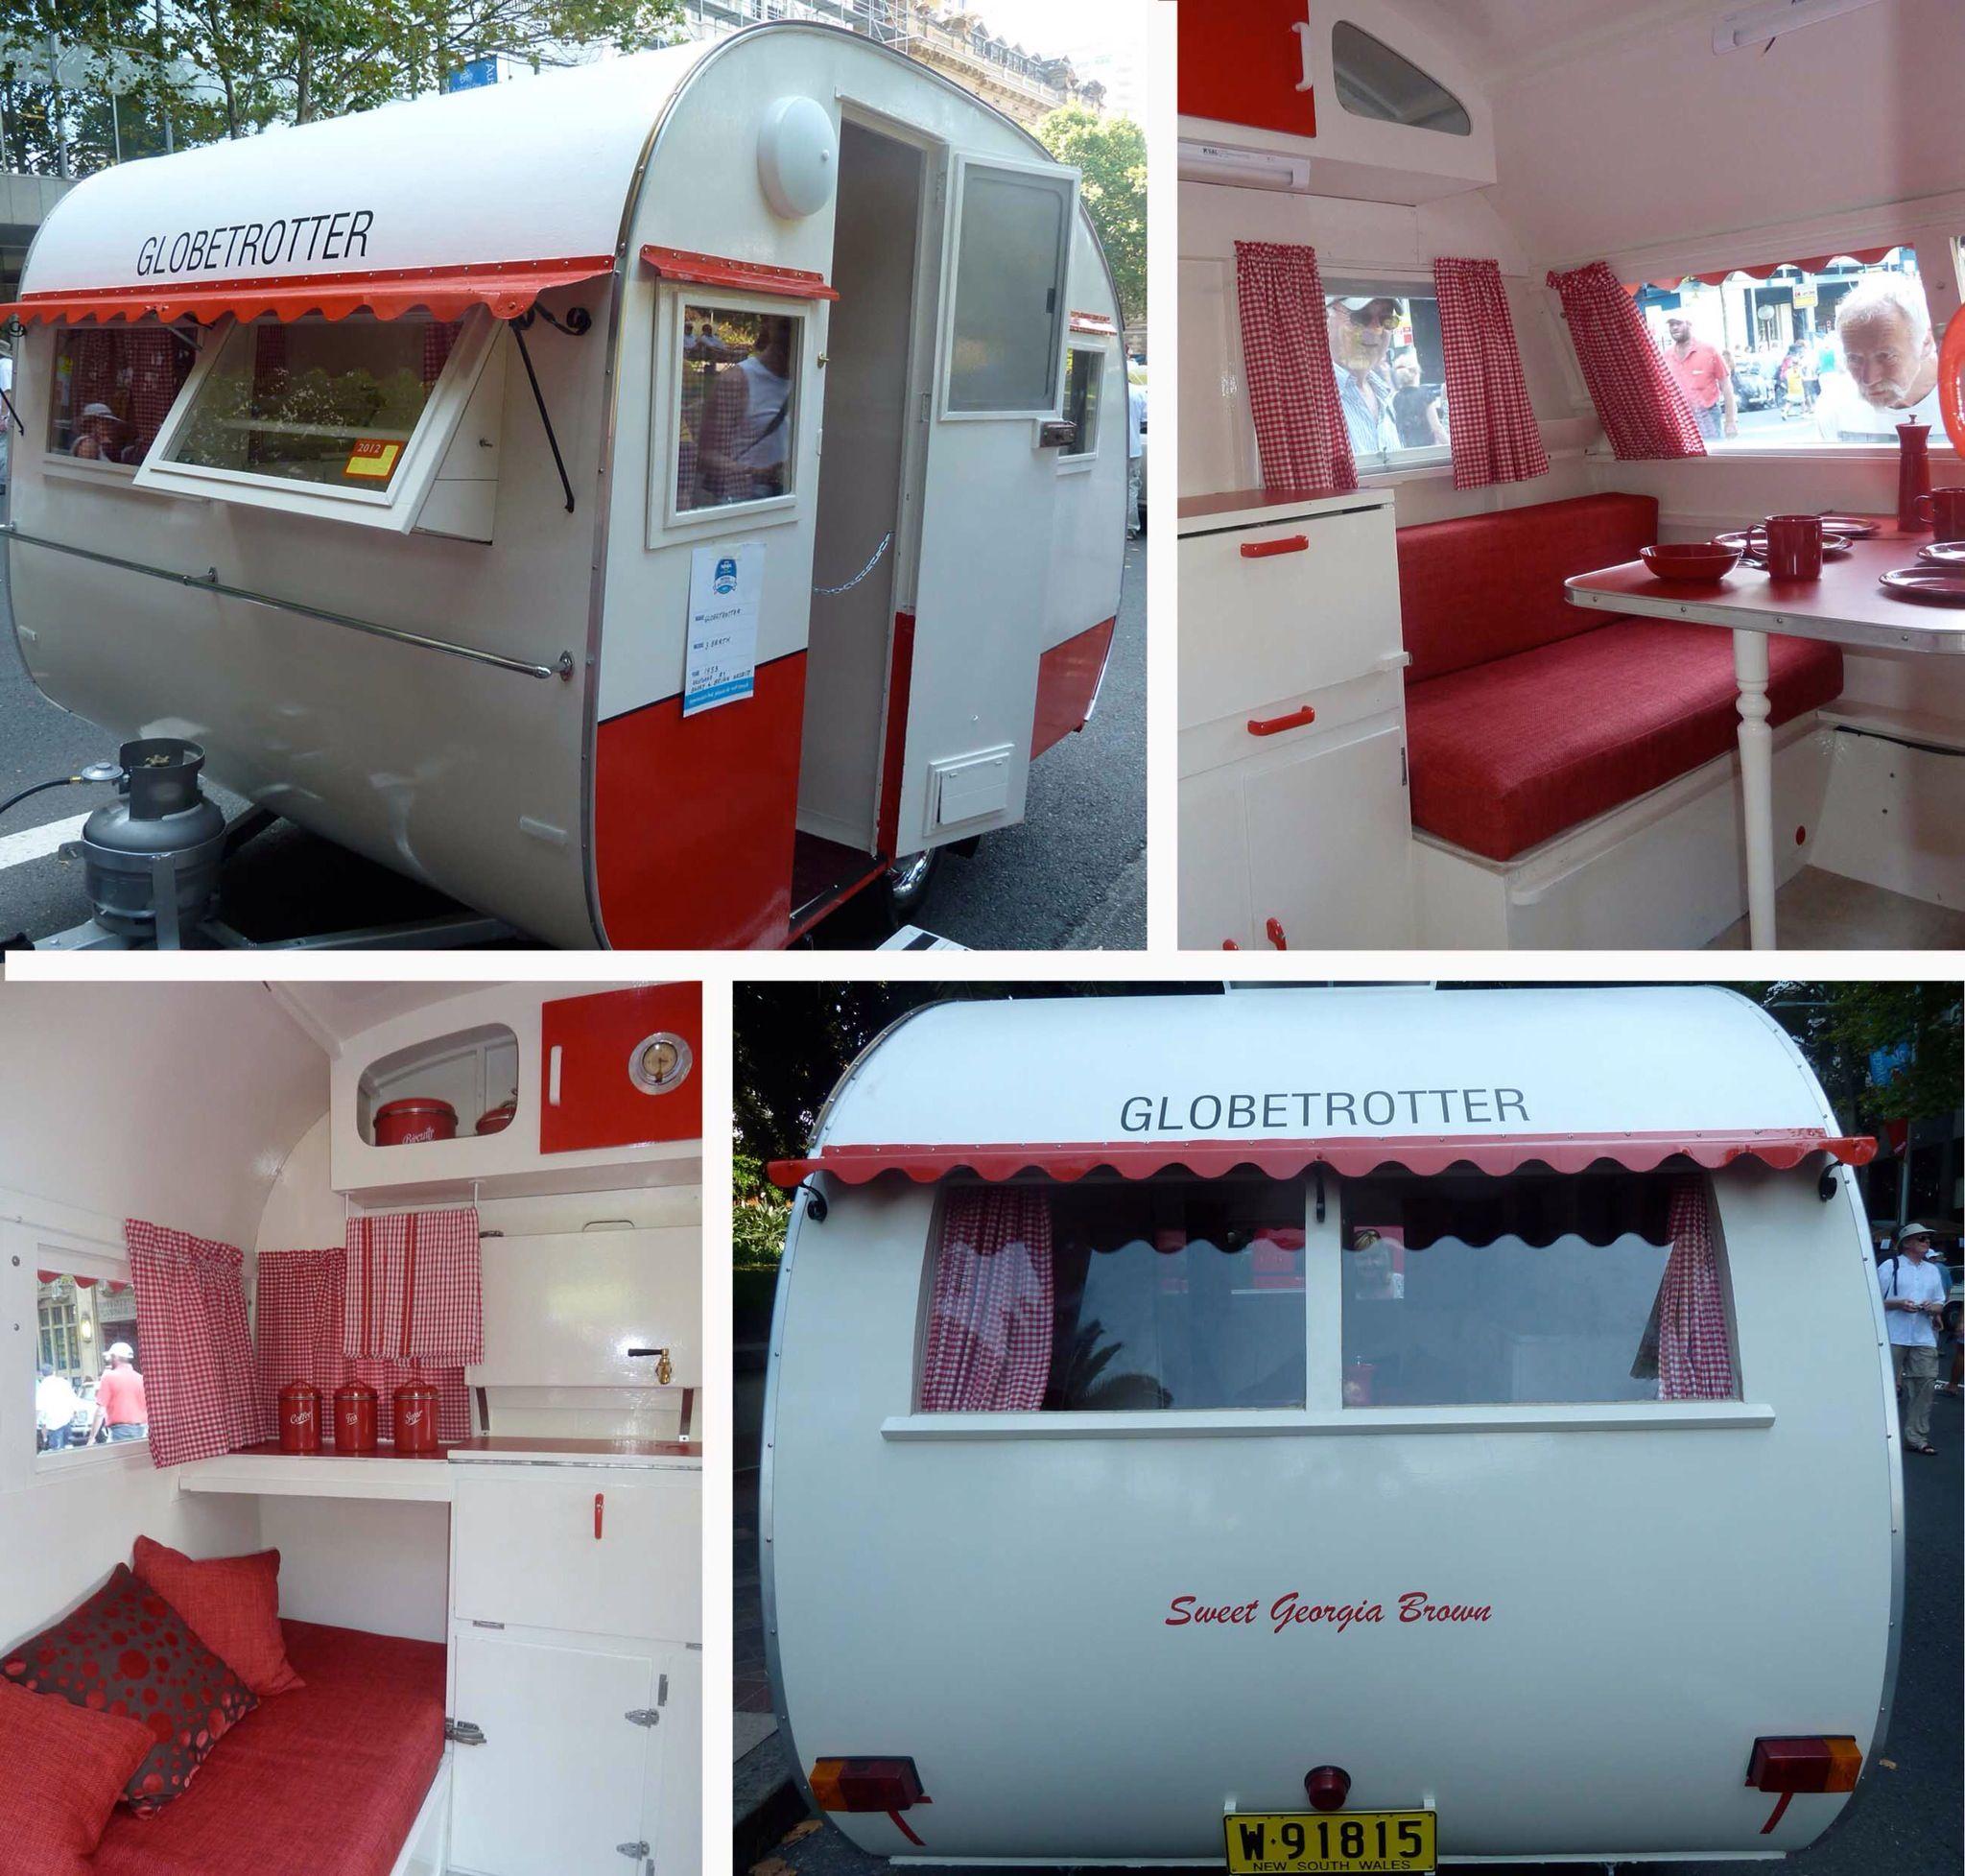 This lovely restored 1964 vintage aristocrat travel trailer is for sale on seattle craigslist for 4500 http seattle craigslist org tac rvs 4023